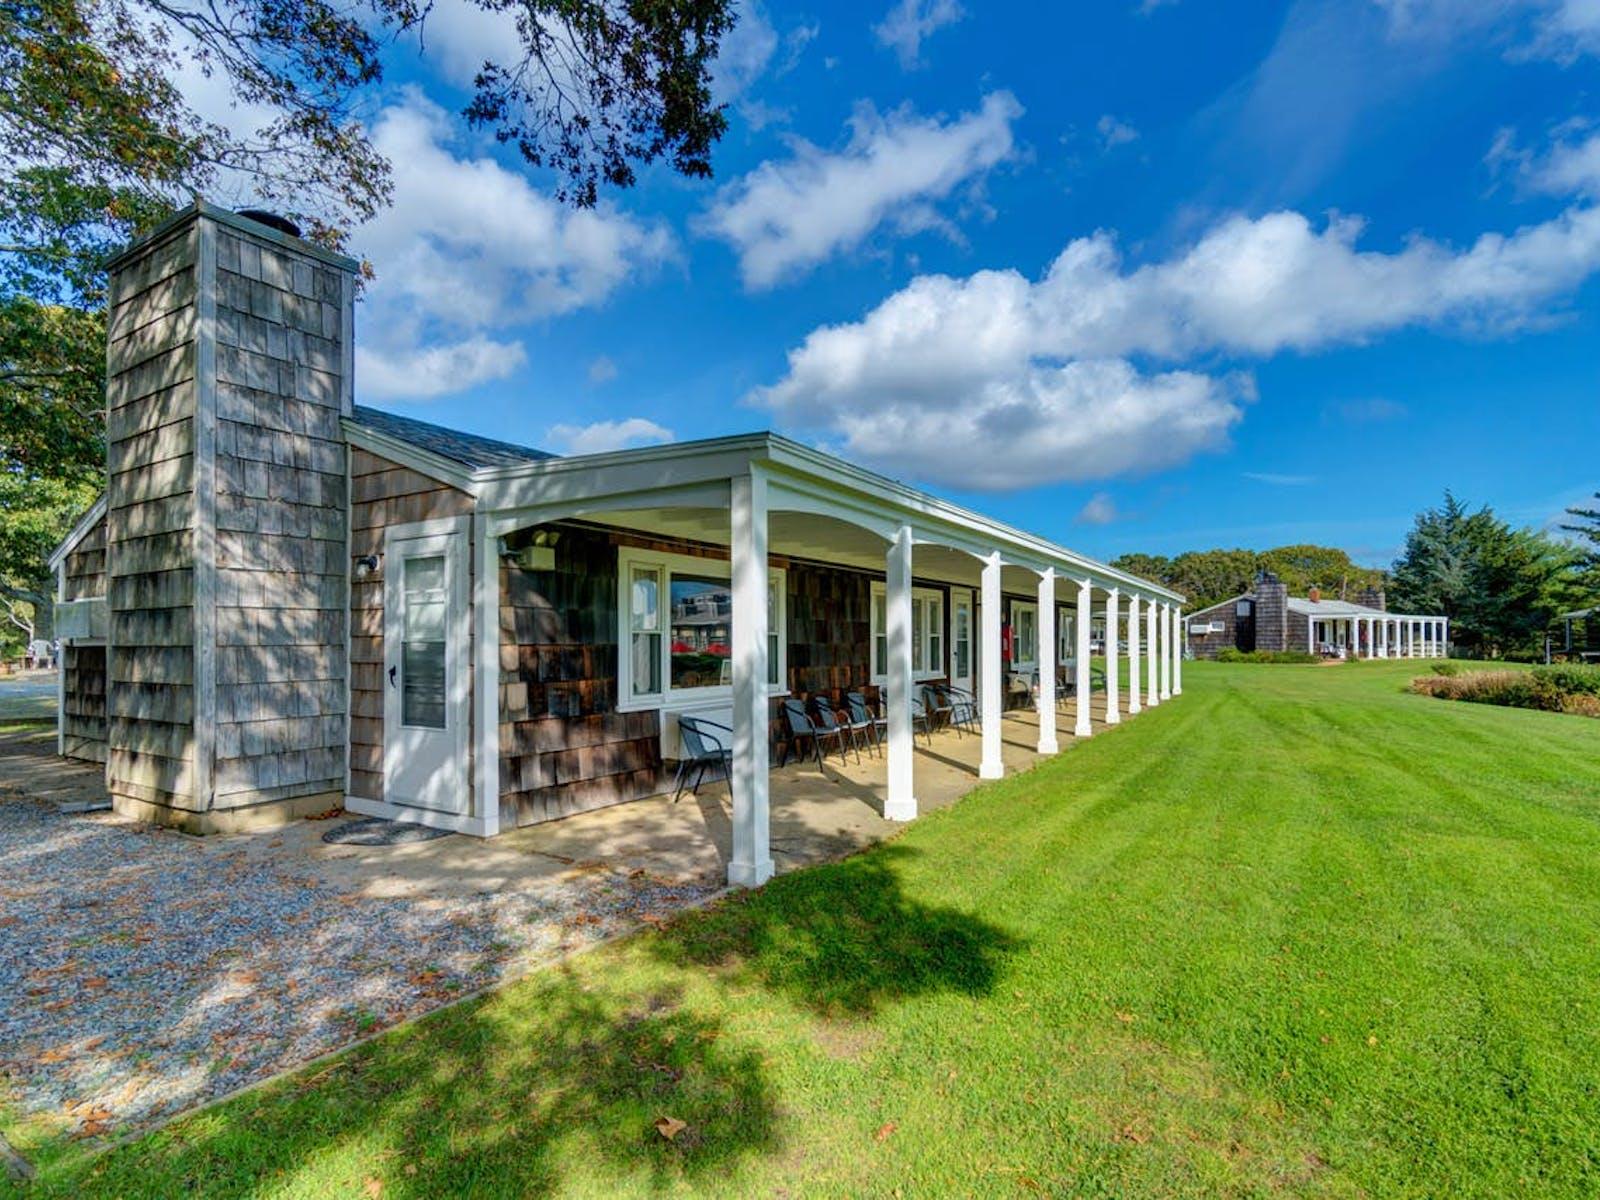 Island Inn buildings as well as expansive lawn